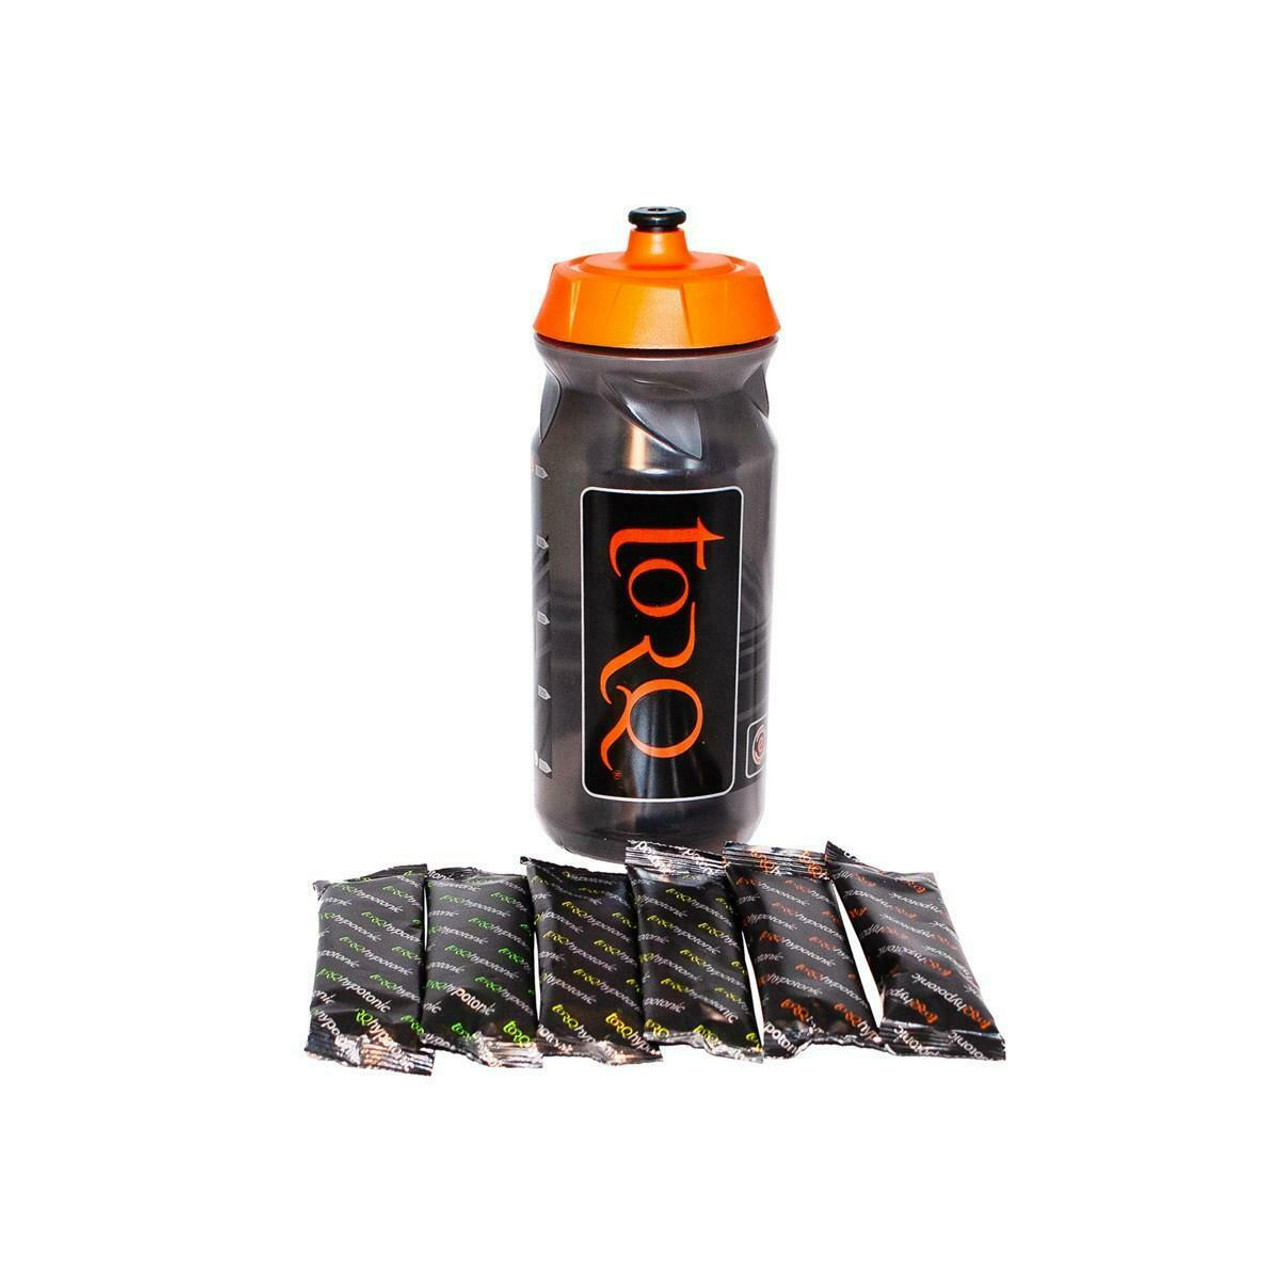 TORQ Hydration Bottle Pack - 500ml Bottle With 6x Single Serve Sachets